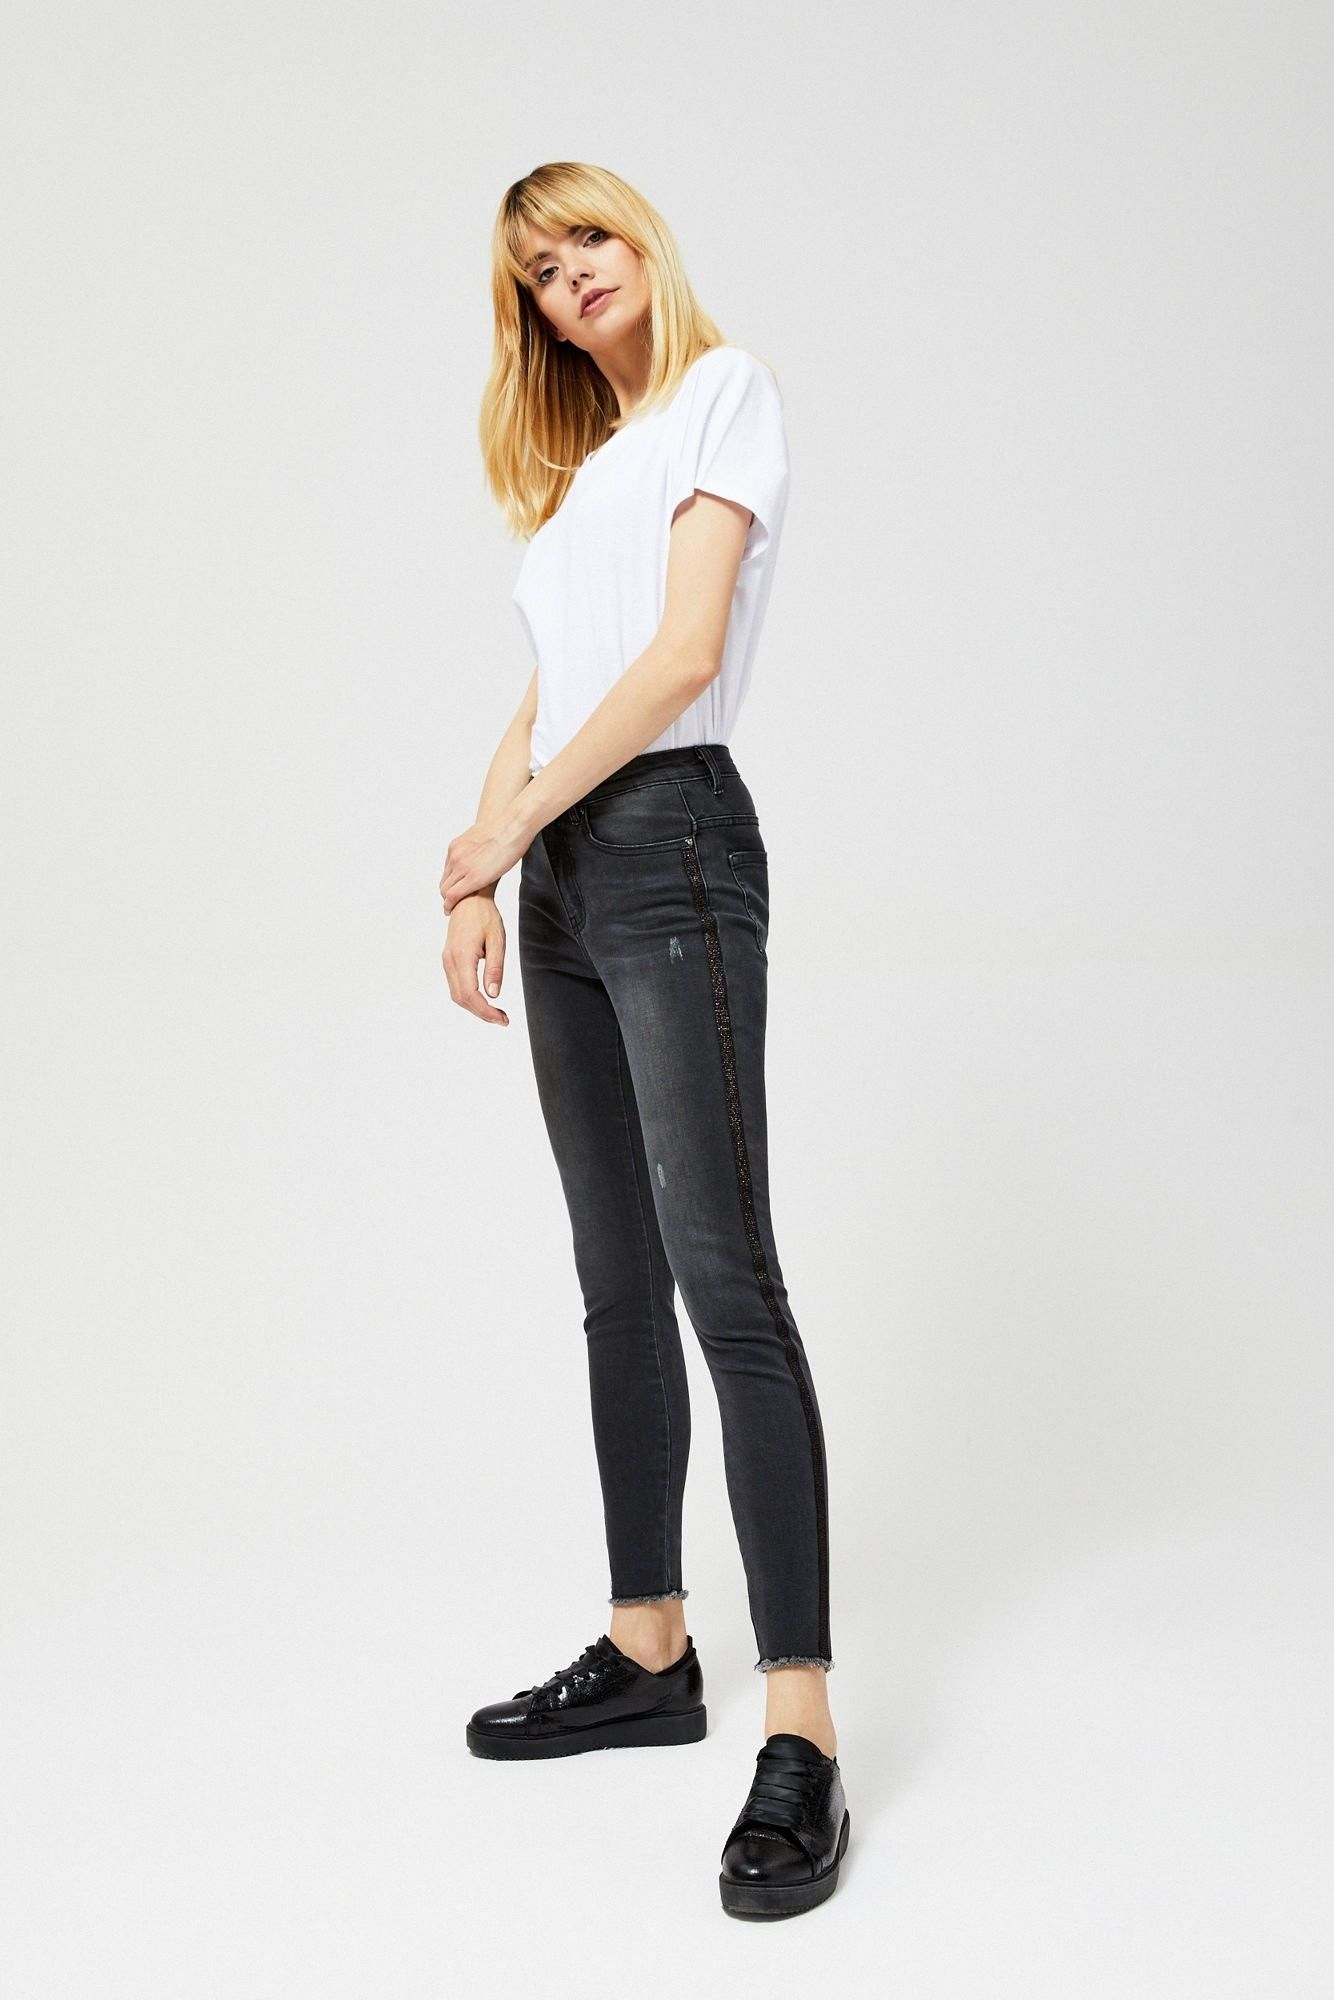 Jeansy typu high waist z lampasami